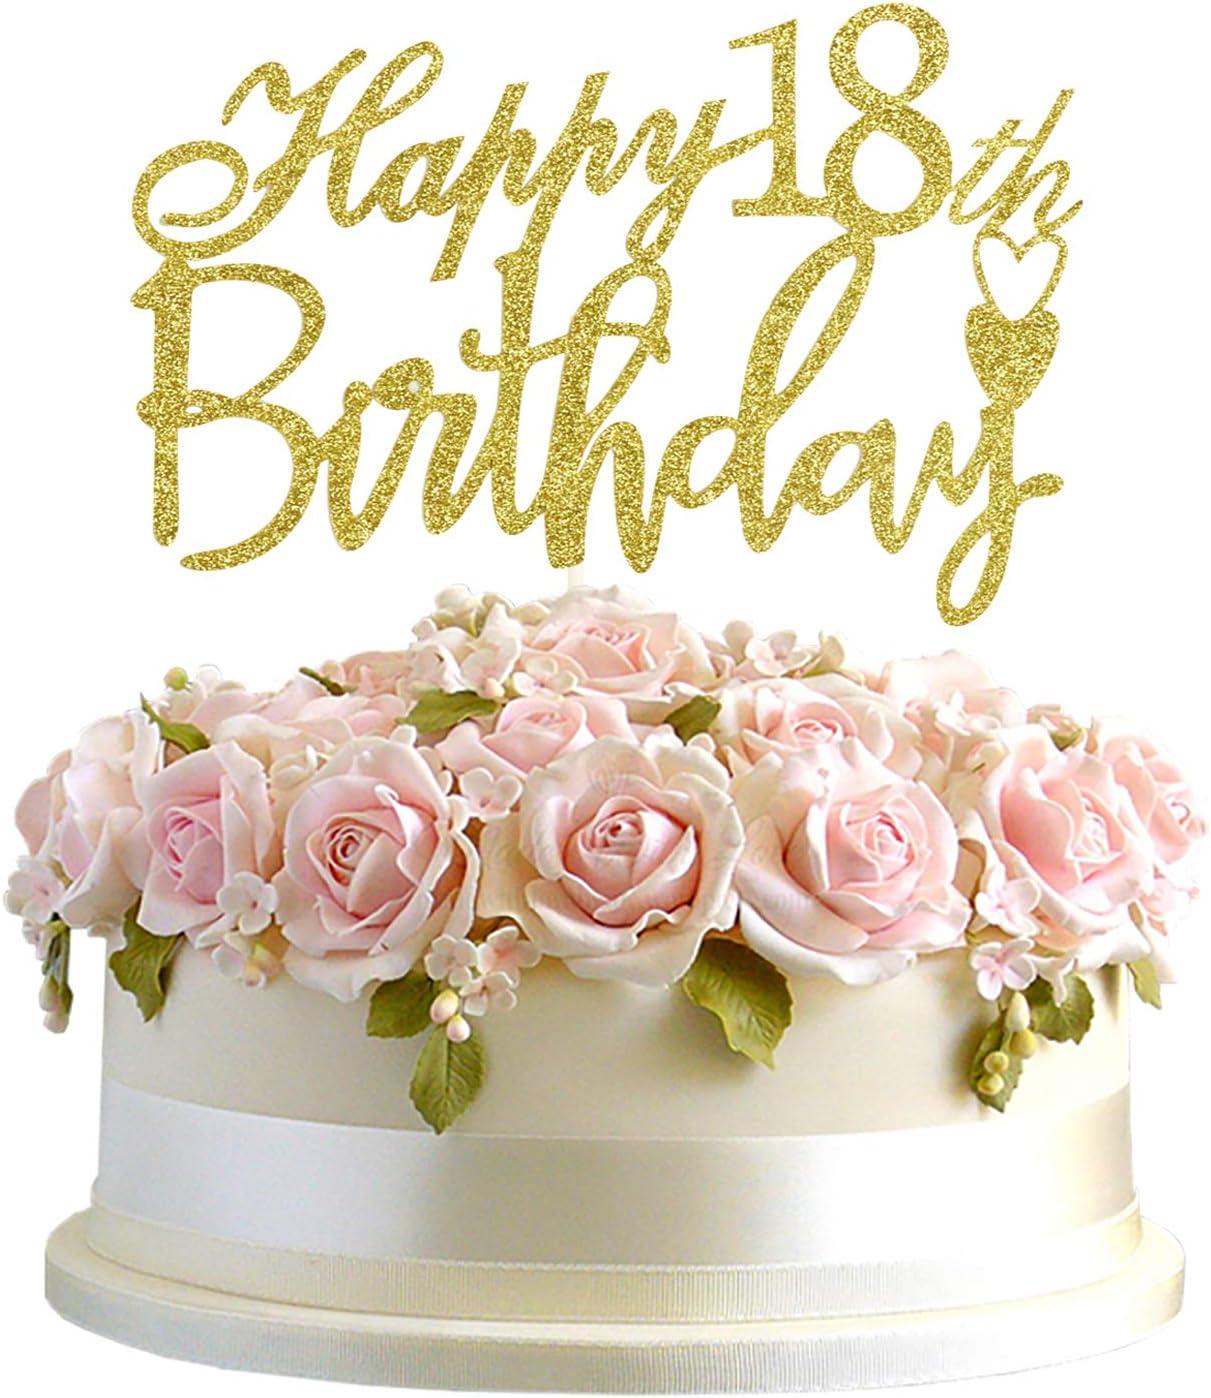 Astounding Amazon Com Junucubo 18Th Birthday Cake Topper Gold Glitter Cheers Birthday Cards Printable Nowaargucafe Filternl